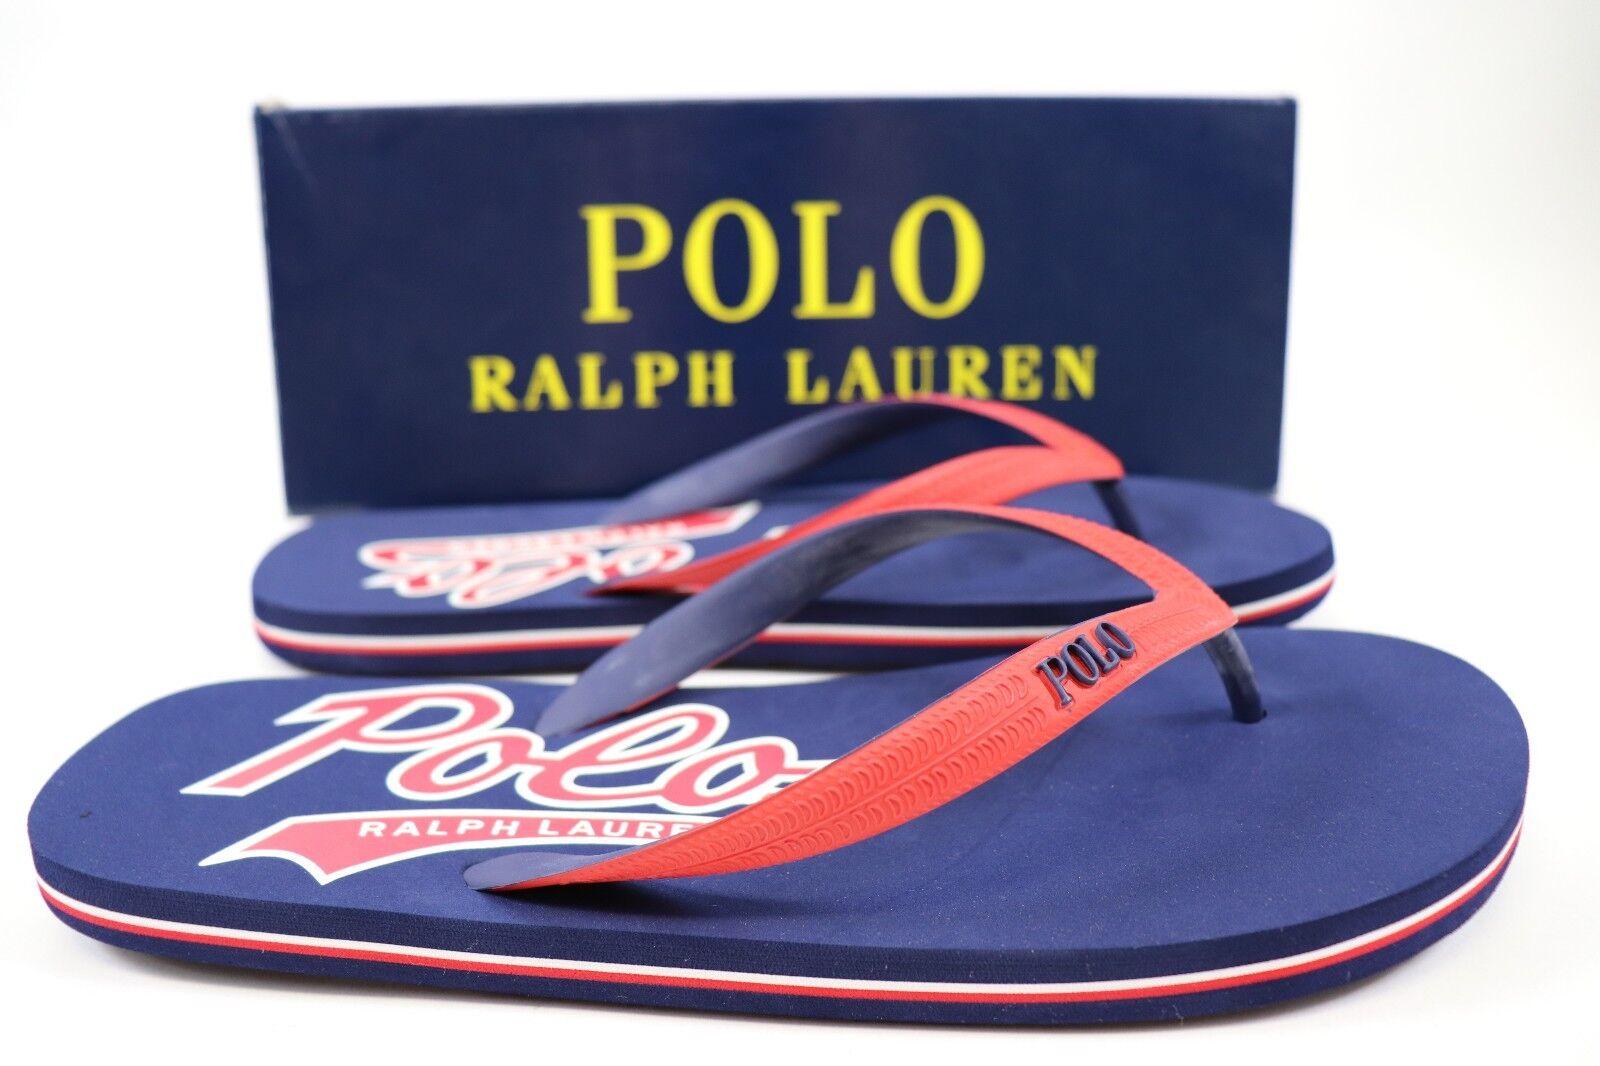 7b0b476b5 Ralph Lauren Size 12 Mens Navy Red Polo Whitlebury II Flip Flop ...